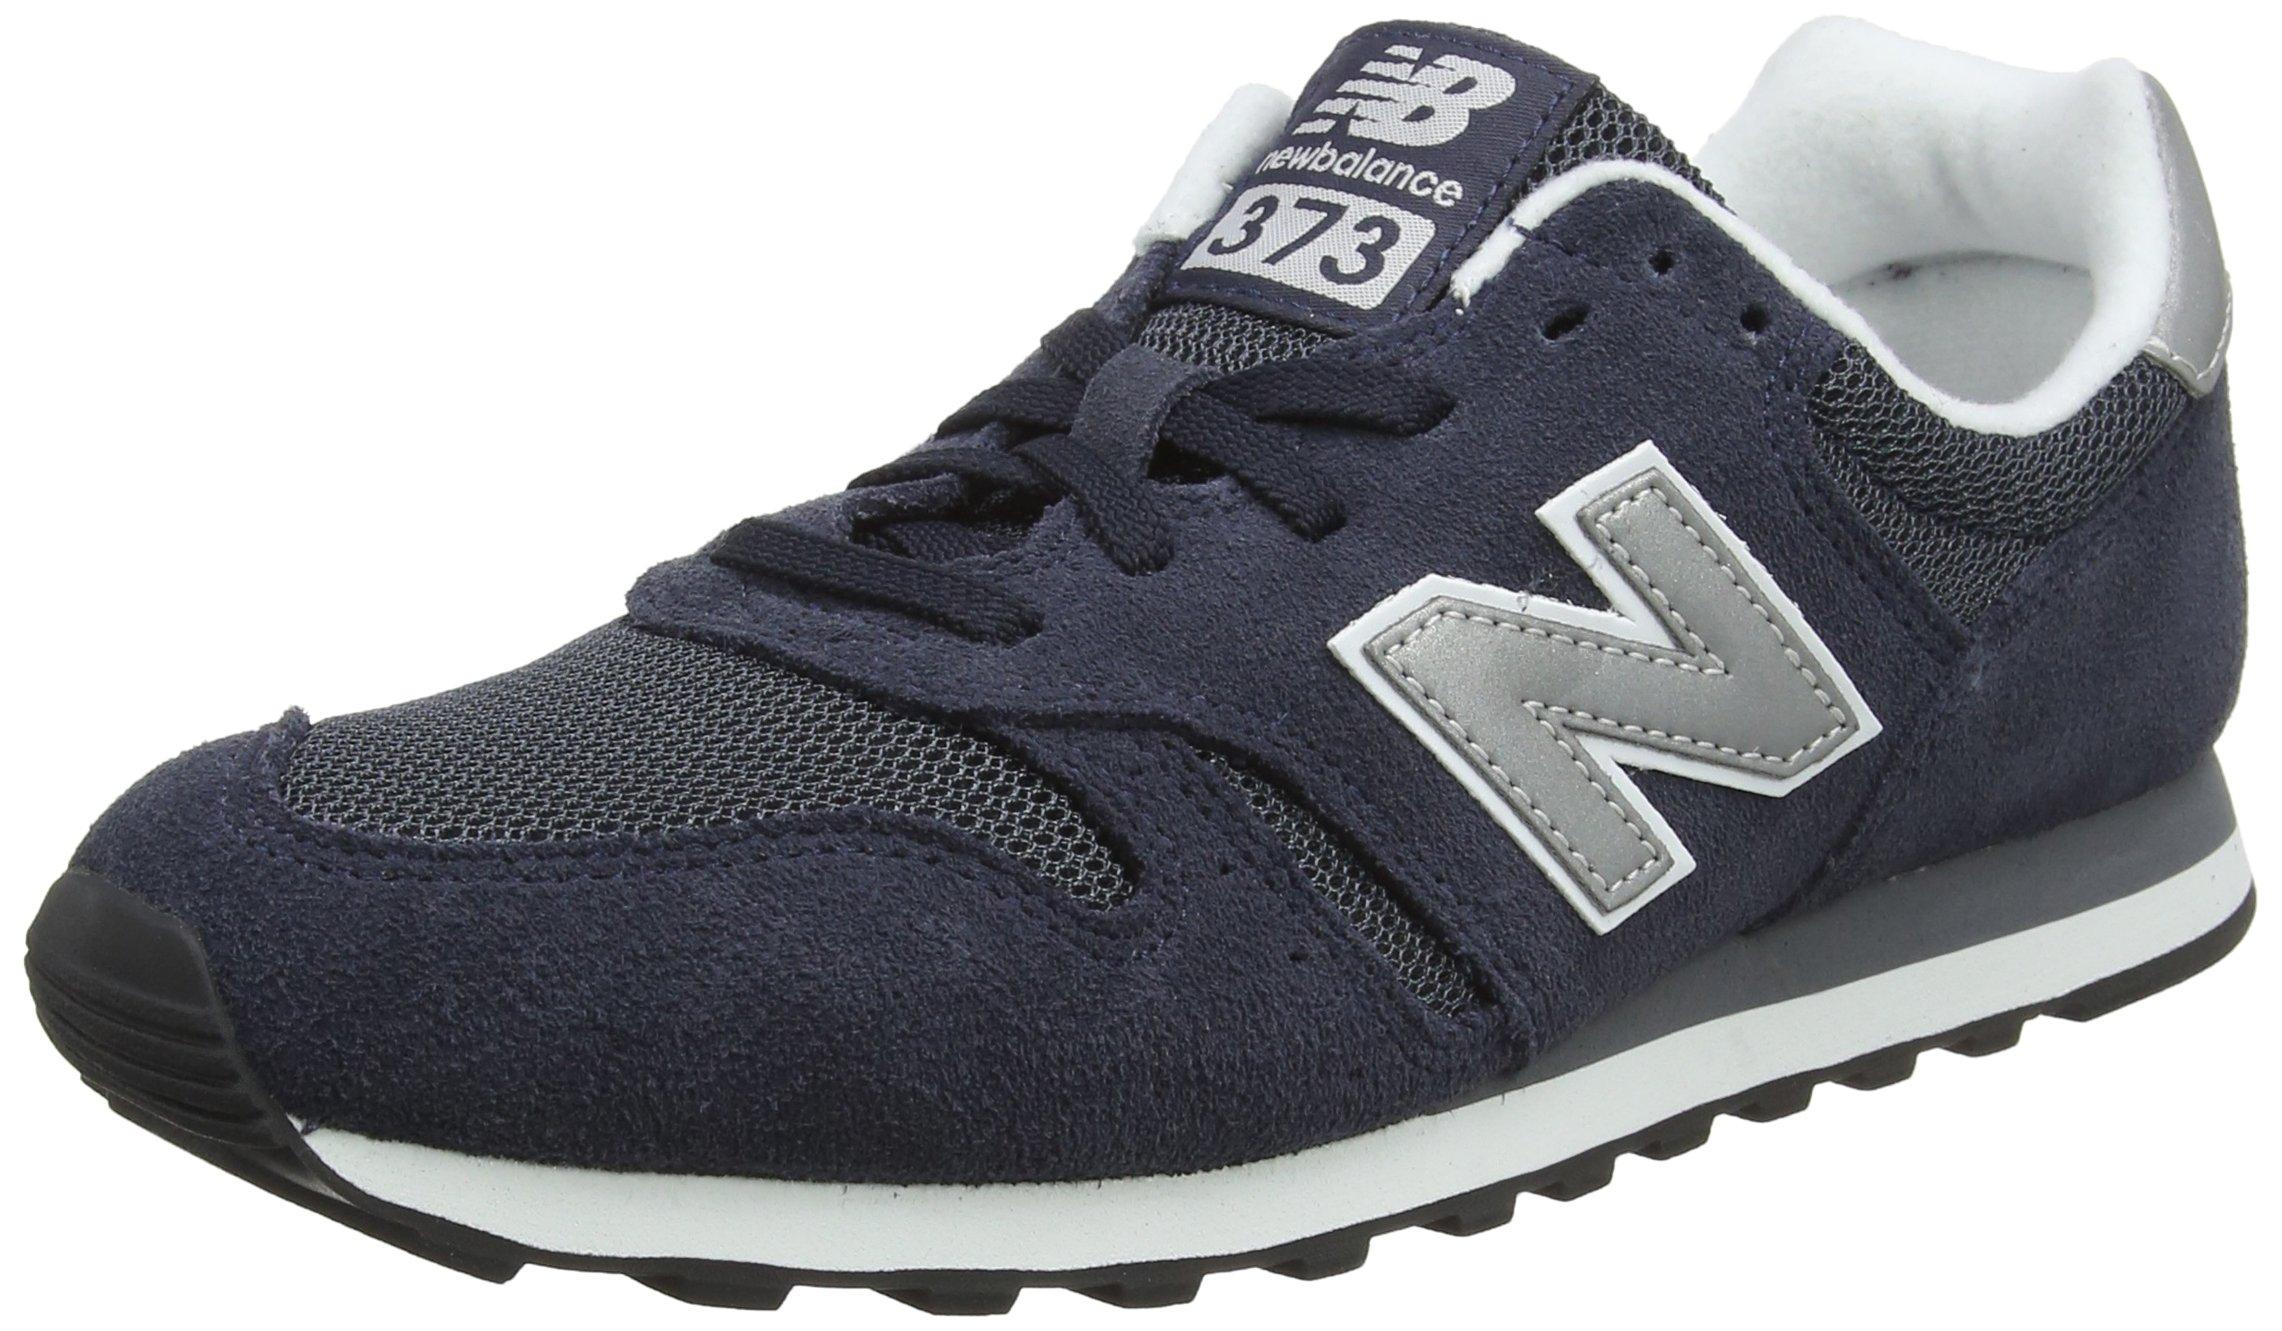 buy online e6796 70ebb New Balance Ml373 Shoes 4.5 D(M) US Navy